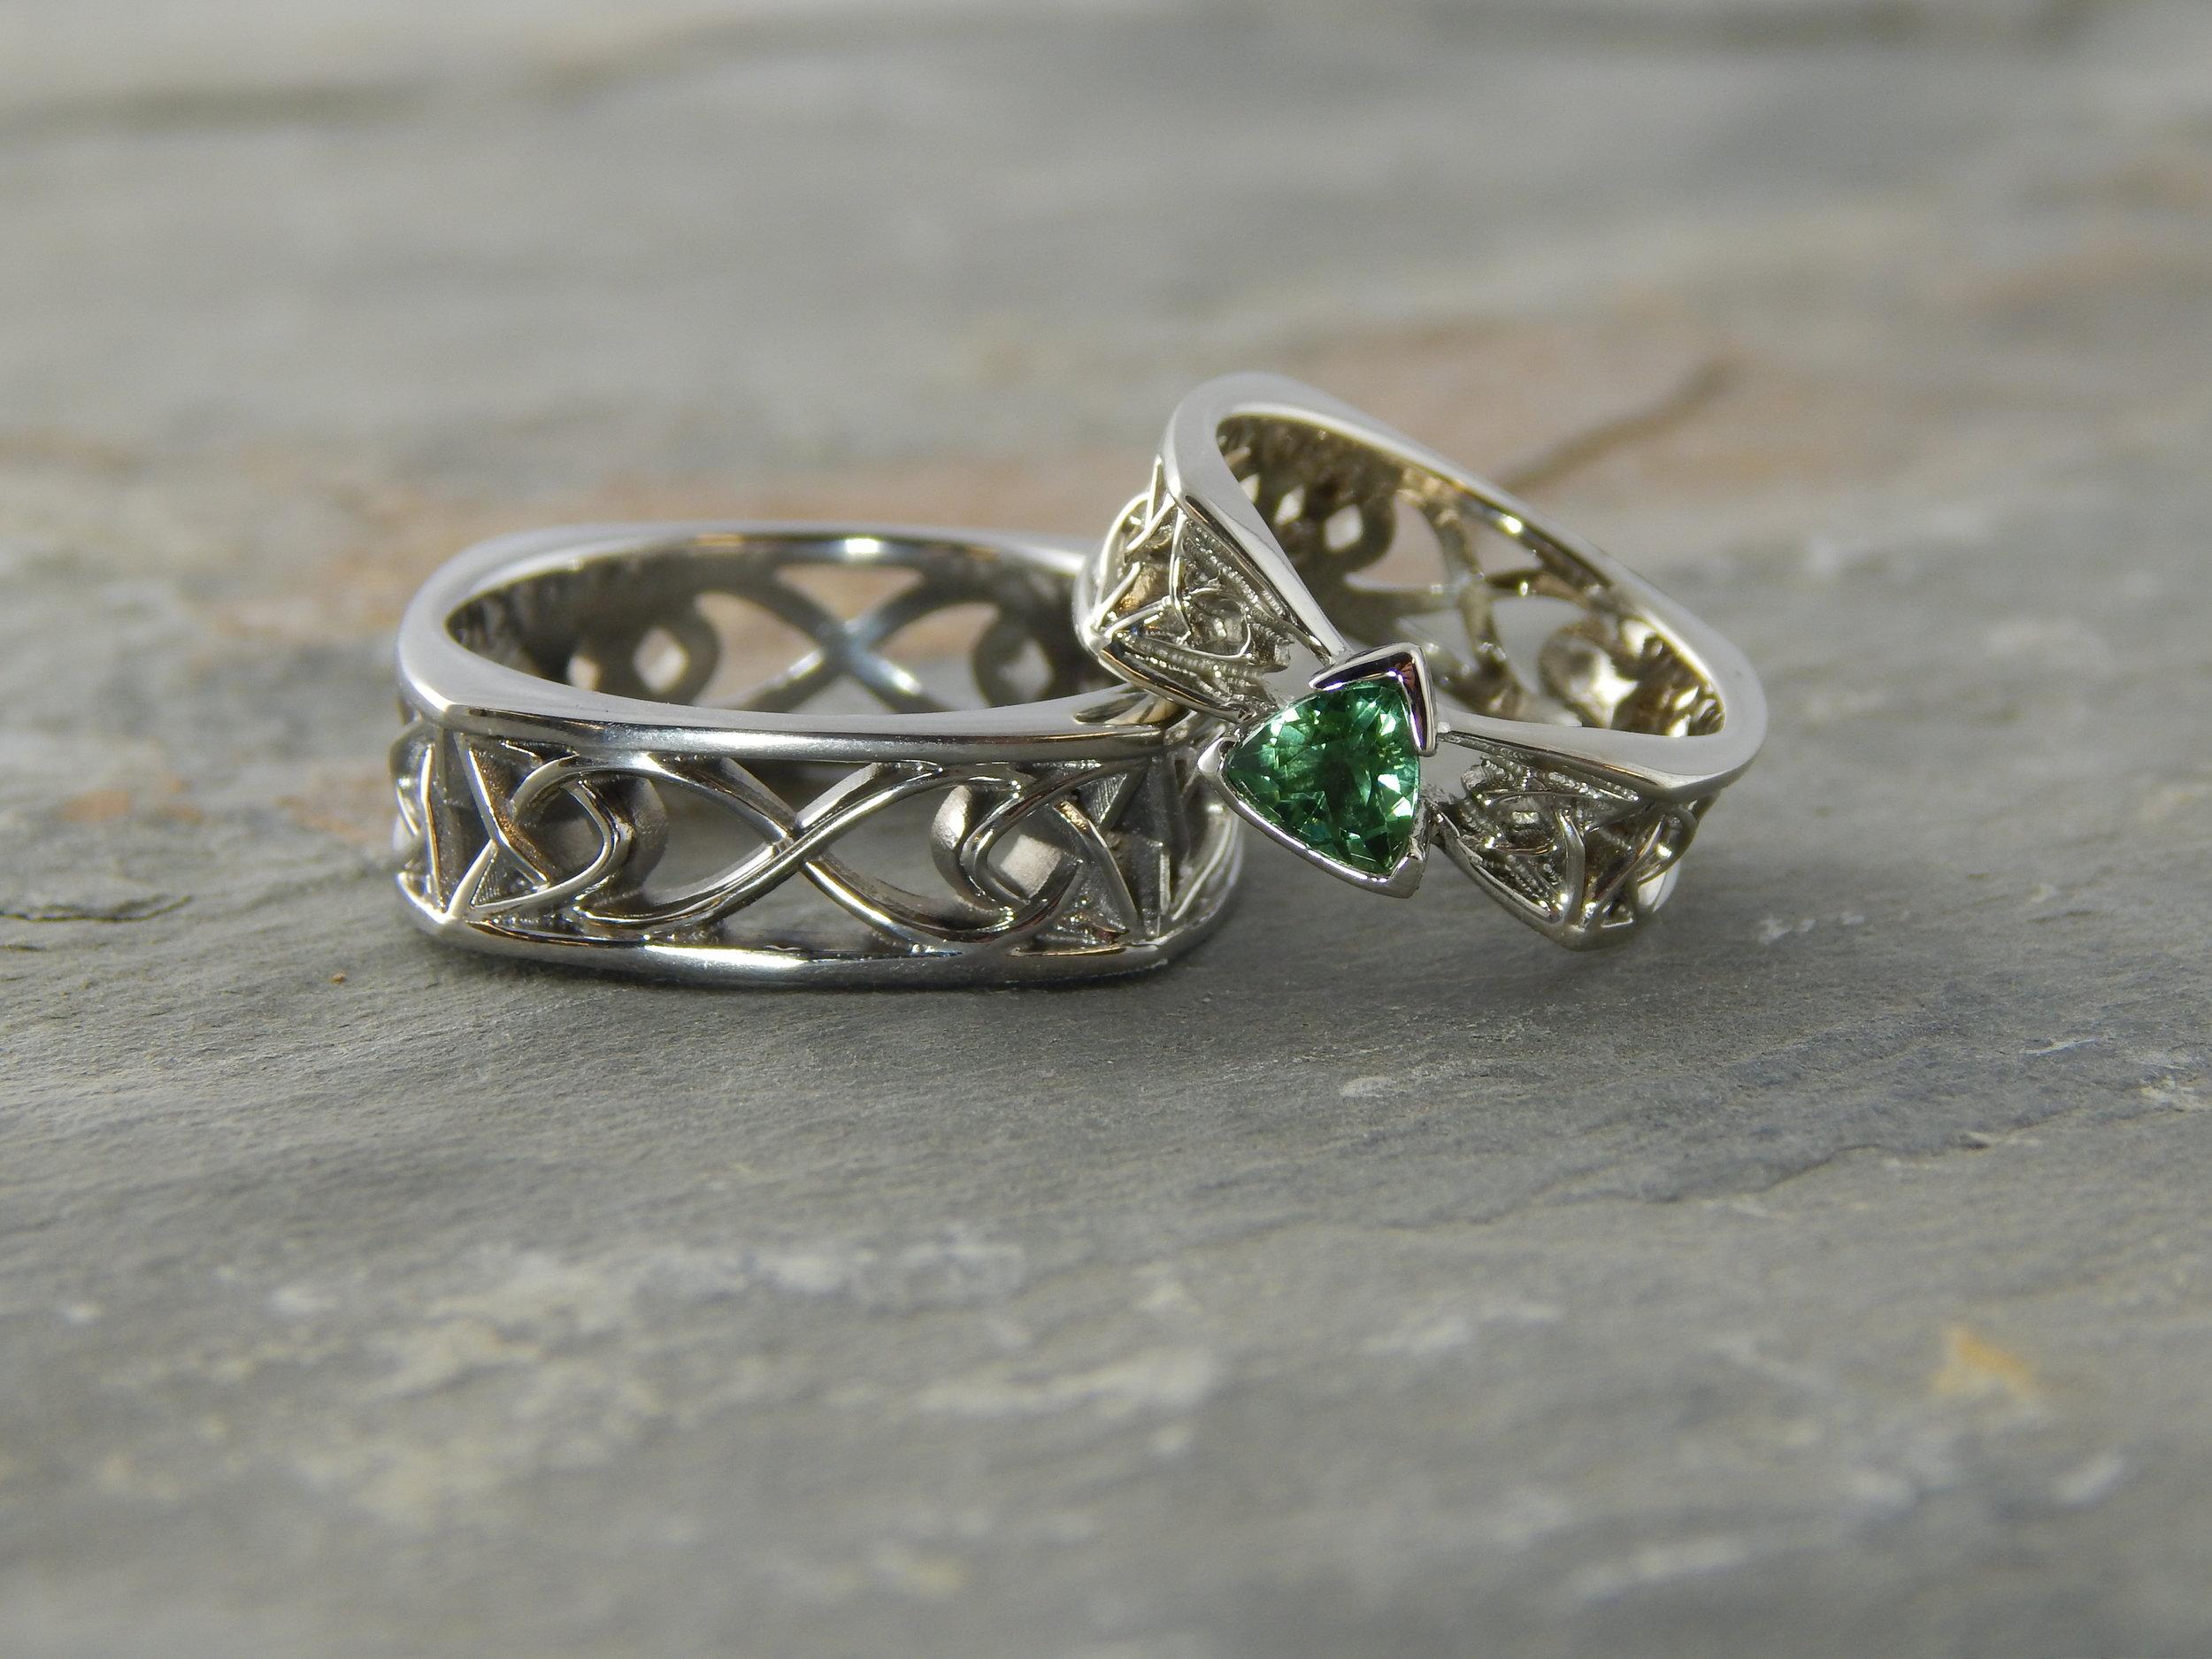 darvier-celtic-trillion-tourmaline-white-gold-wedding-set.JPG